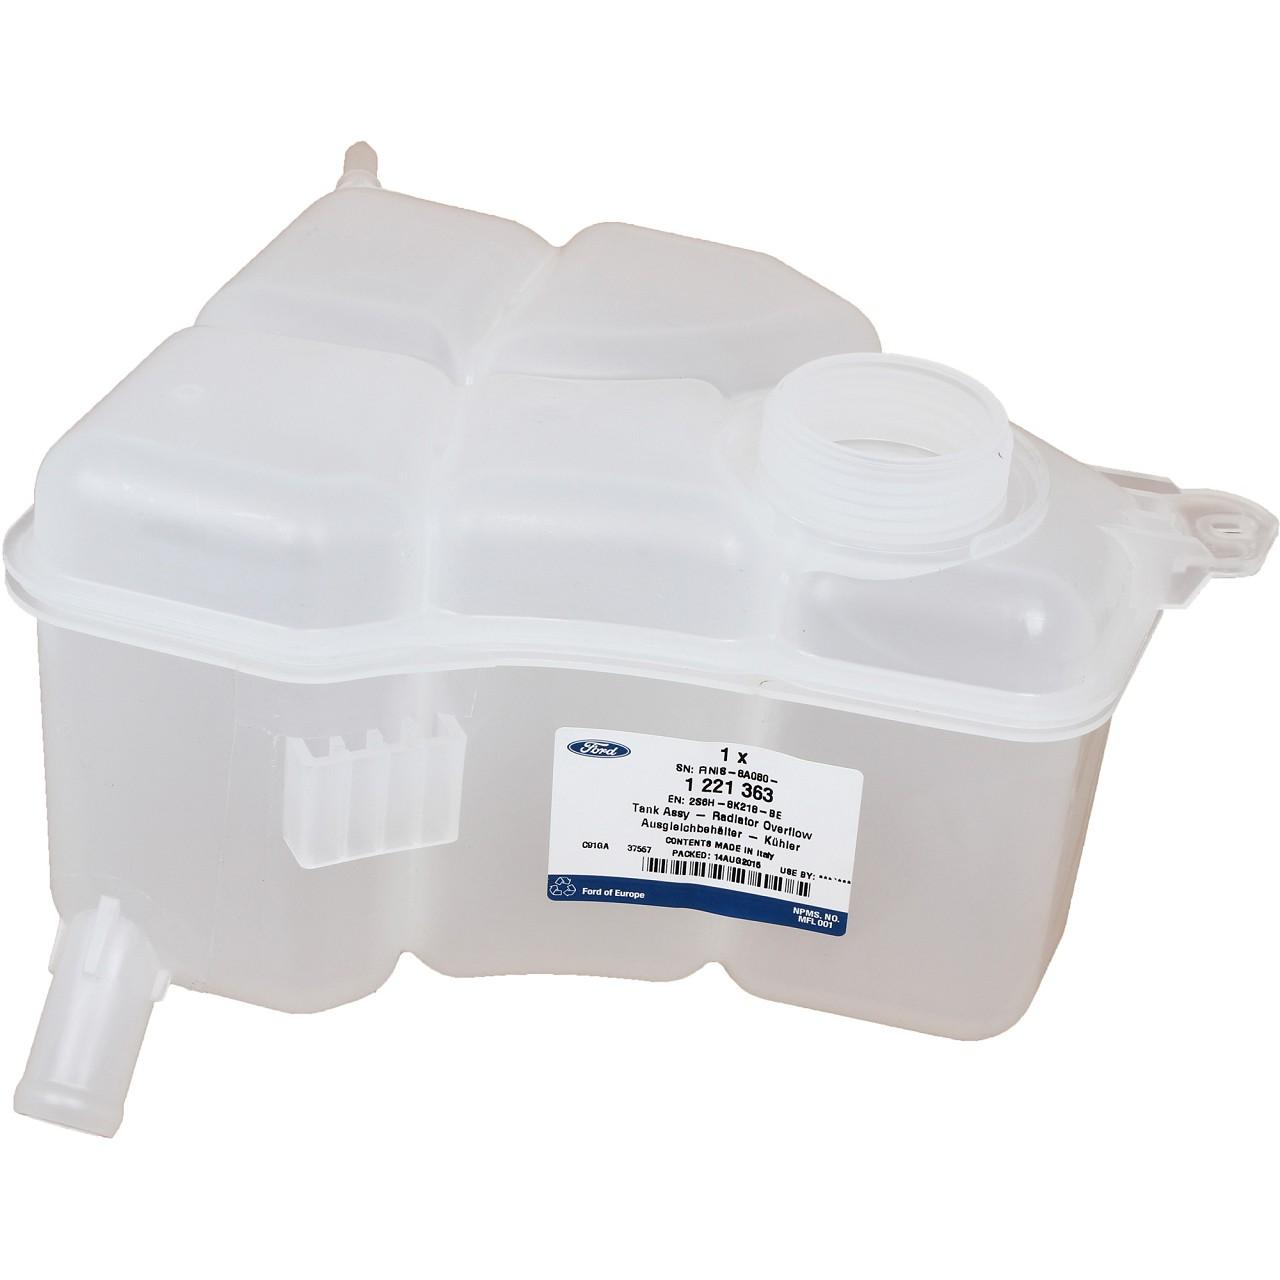 ORIGINAL Ford Ausgleichsbehälter Kühlmittelbehälter Fiesta V 1.3 1.4TDCi 1221363